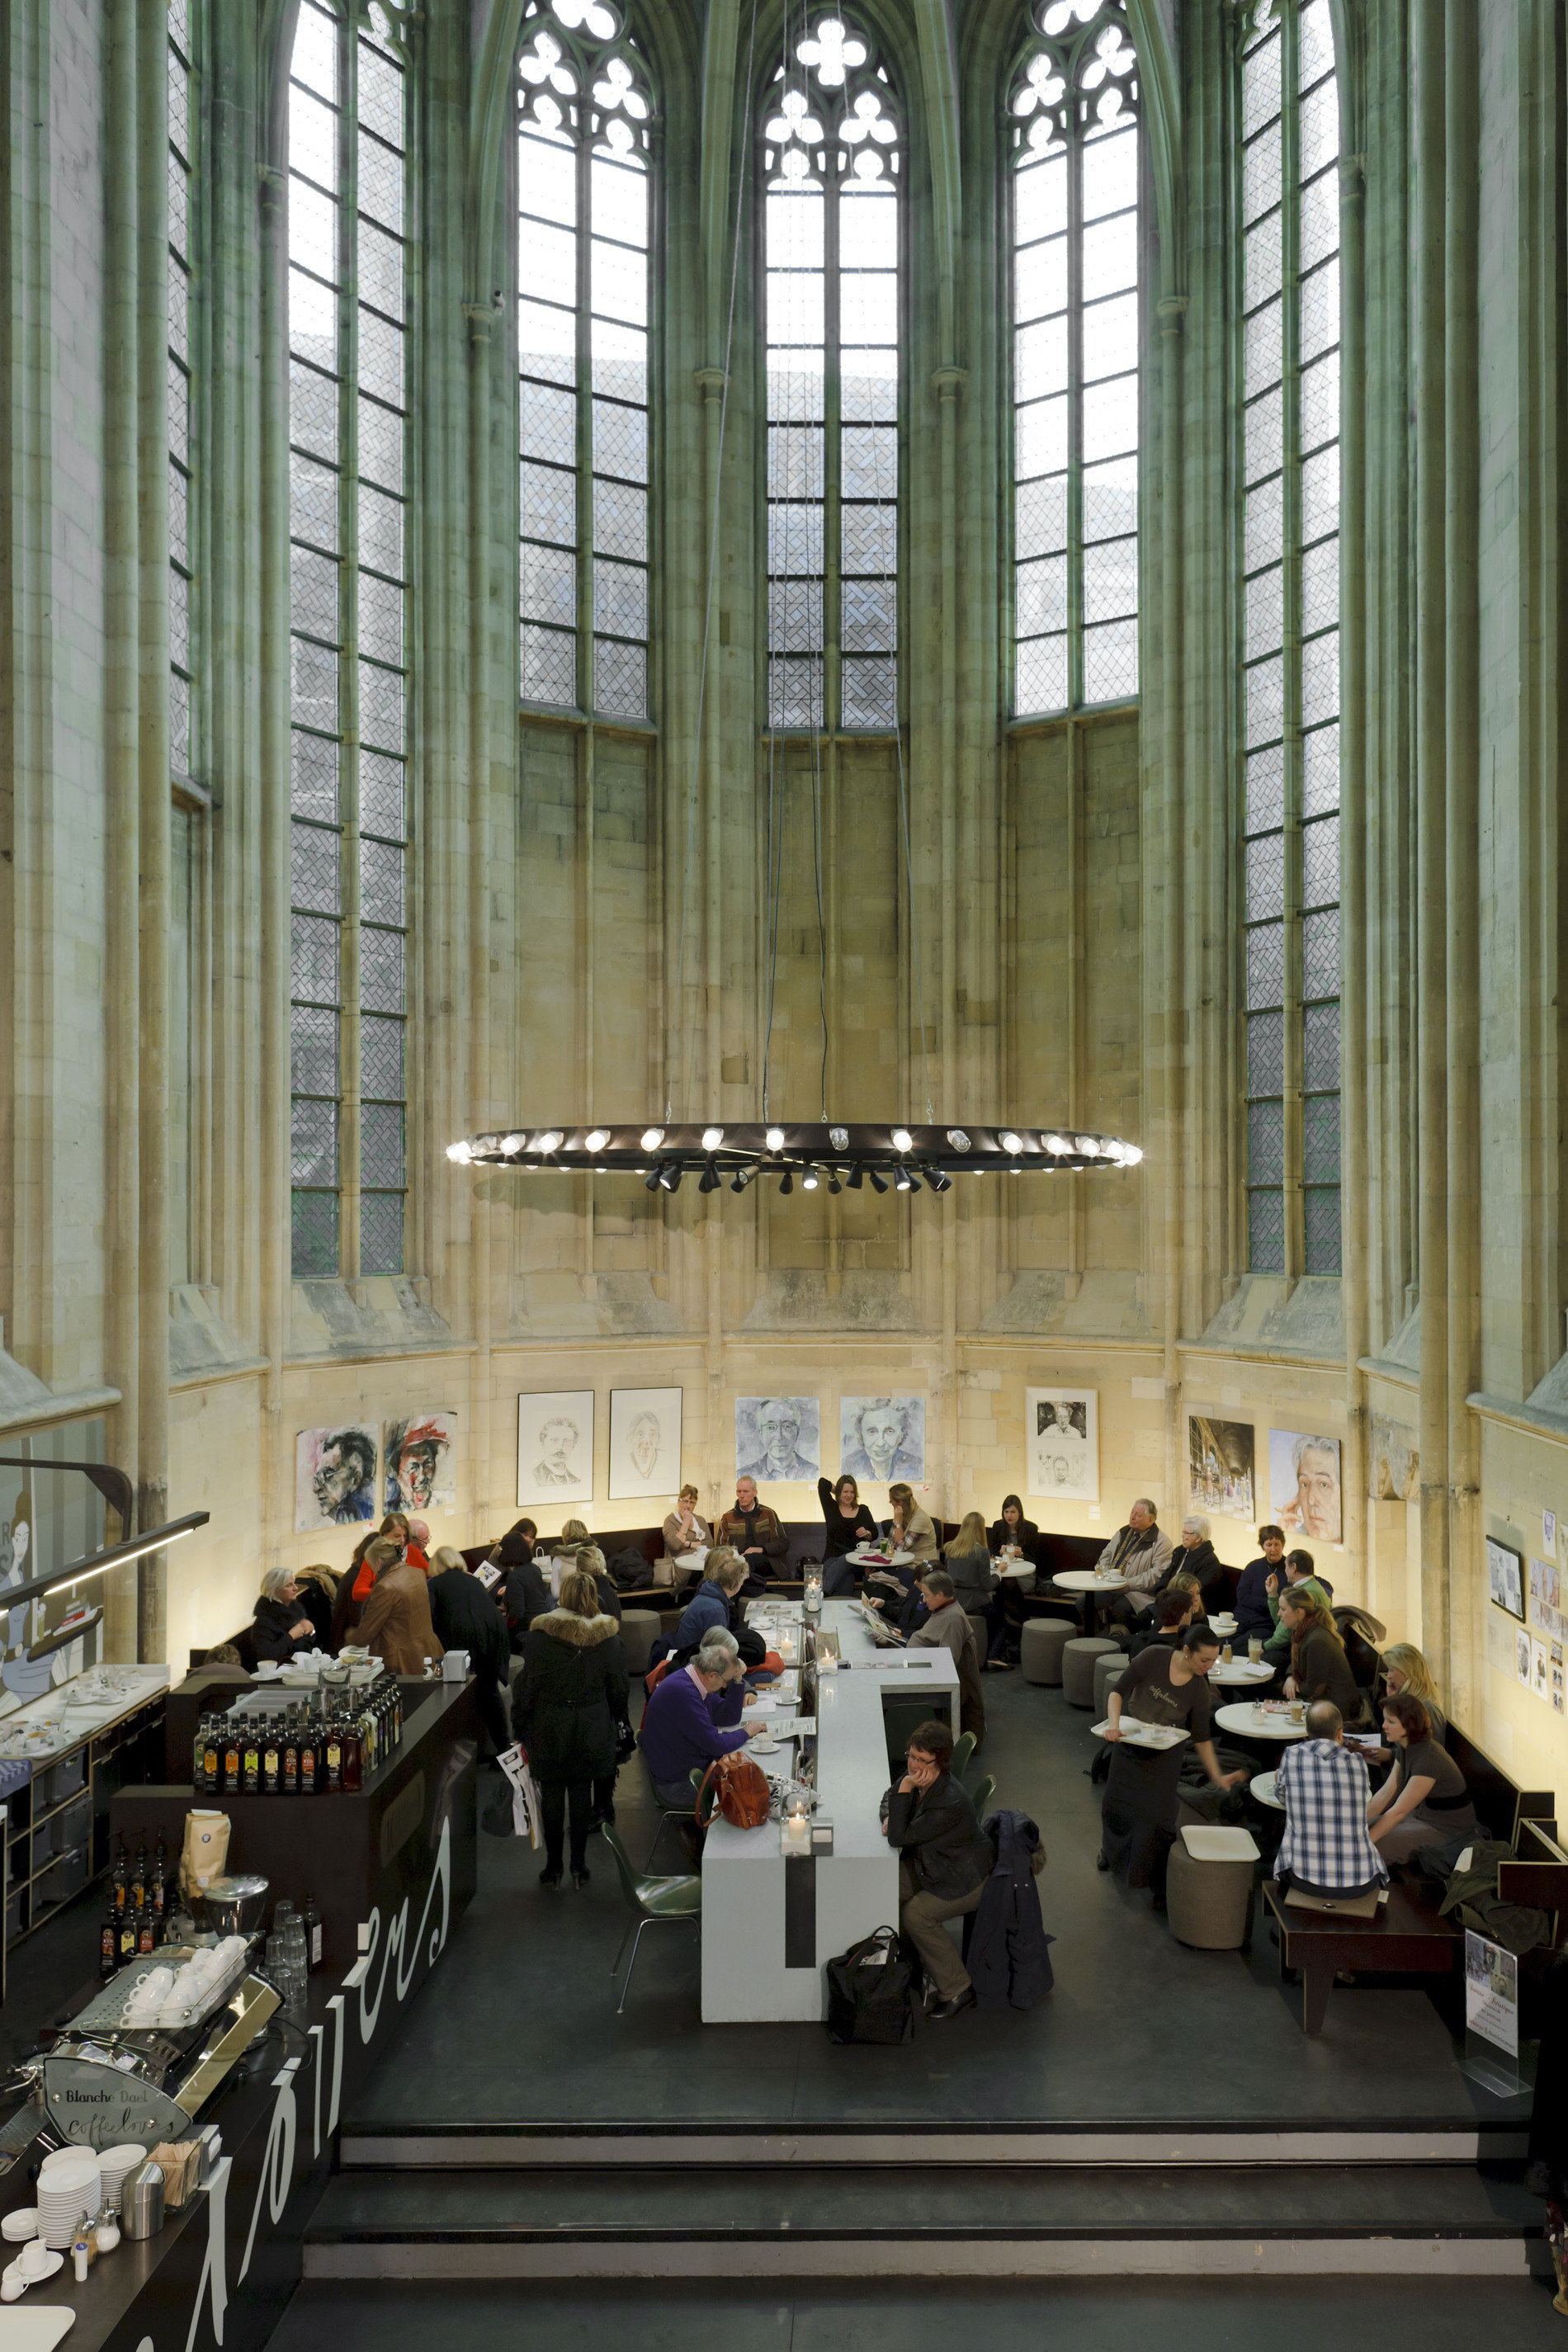 Trip Ideas indoor window building Architecture interior design tourist attraction Design several colonnade